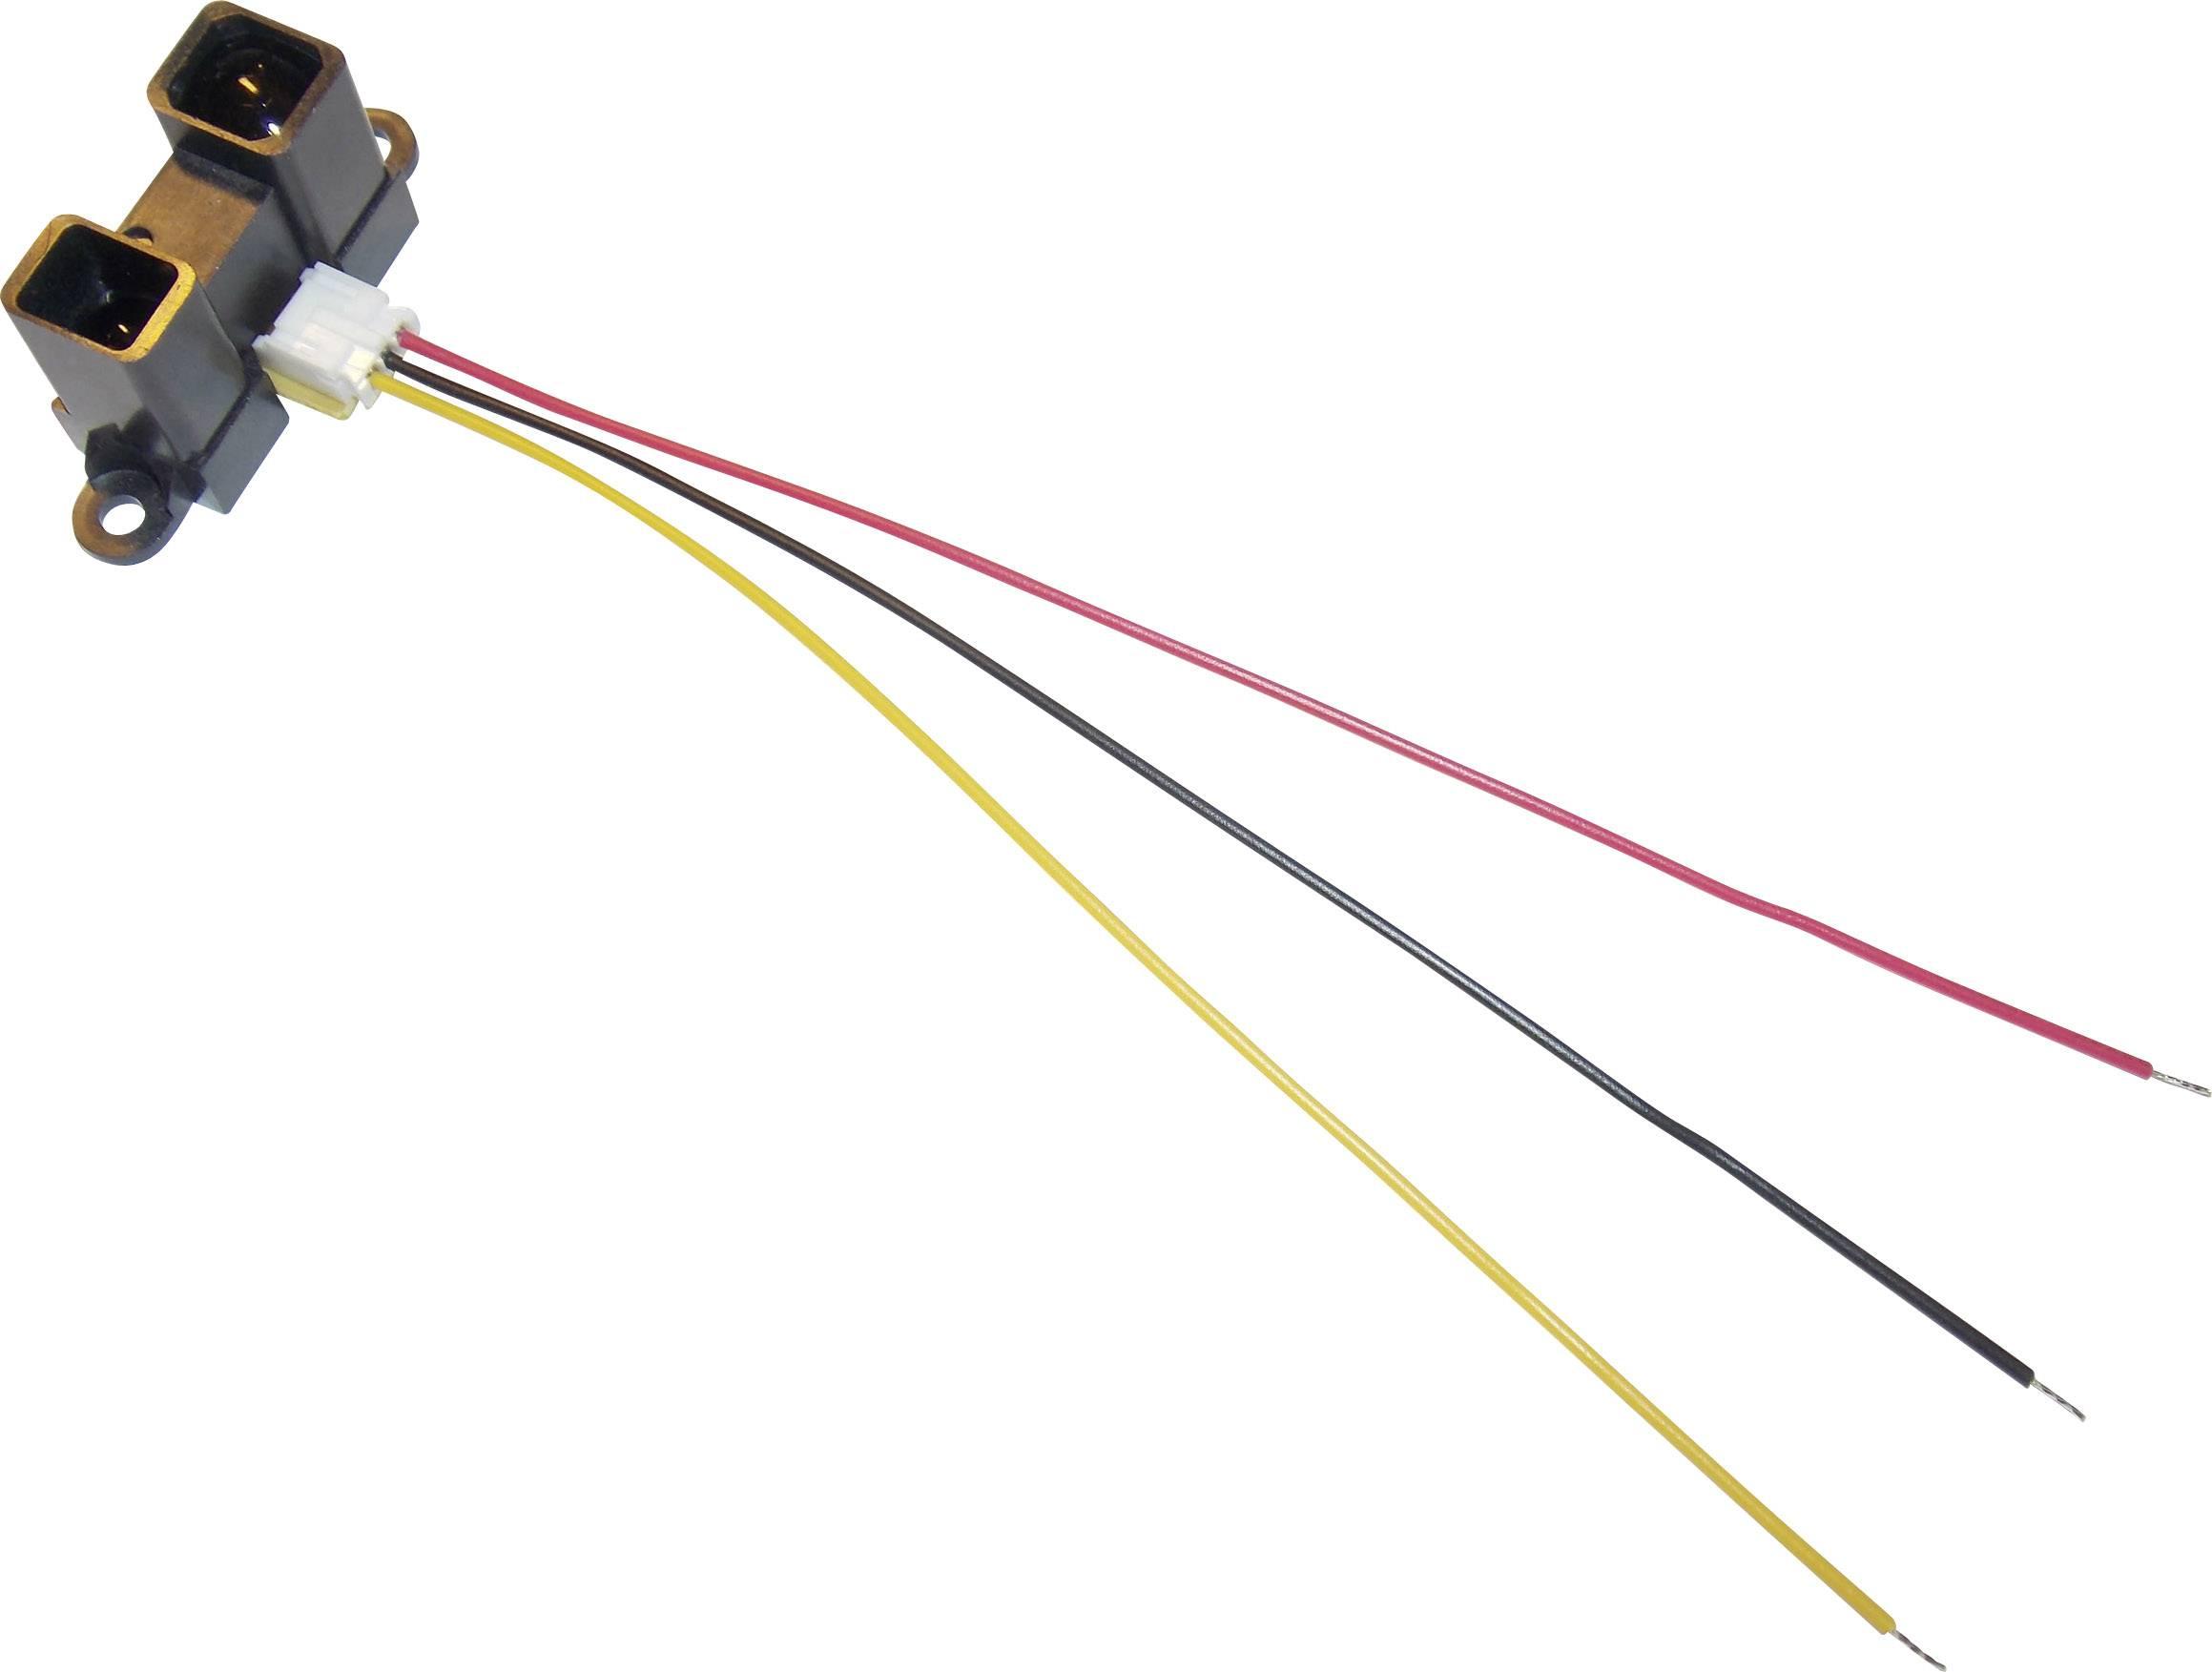 Senzor na meranie vzdialenosti Sharp GP2Y0D02YK, rozsah 20 - 150 cm, 5 V/DC